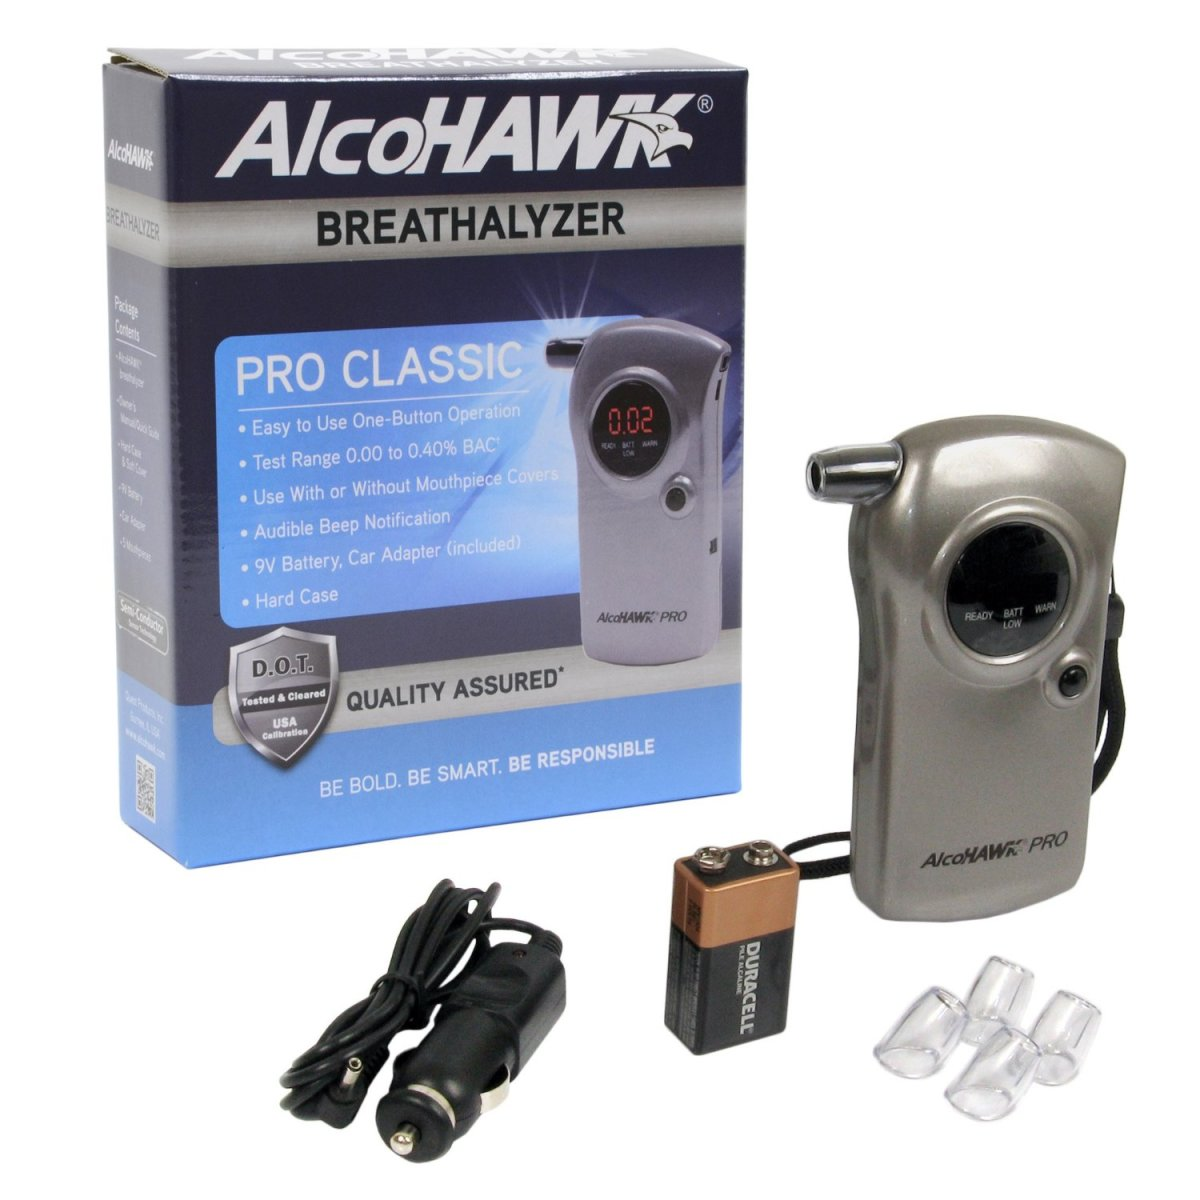 NAlcoHawk Pro: Professional Edition Digital Alcohol Detec